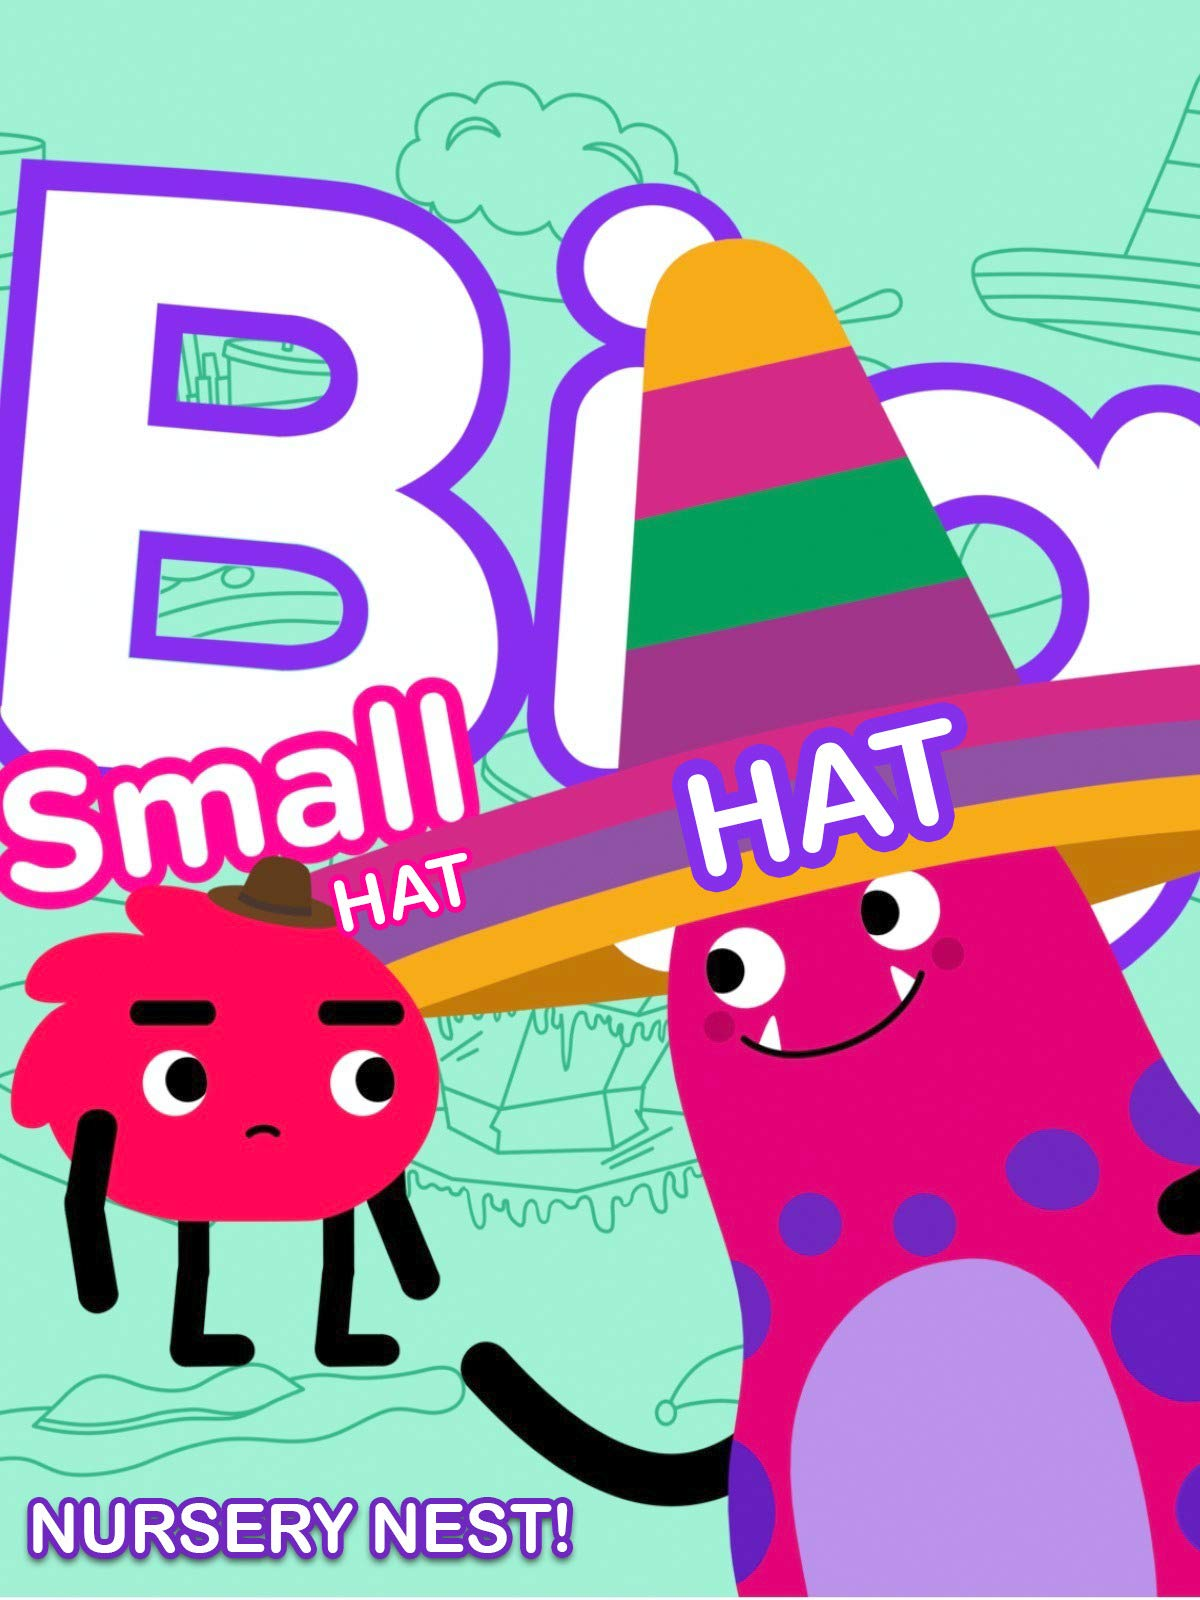 Big Hat, Small Hat! Nursery Nest!